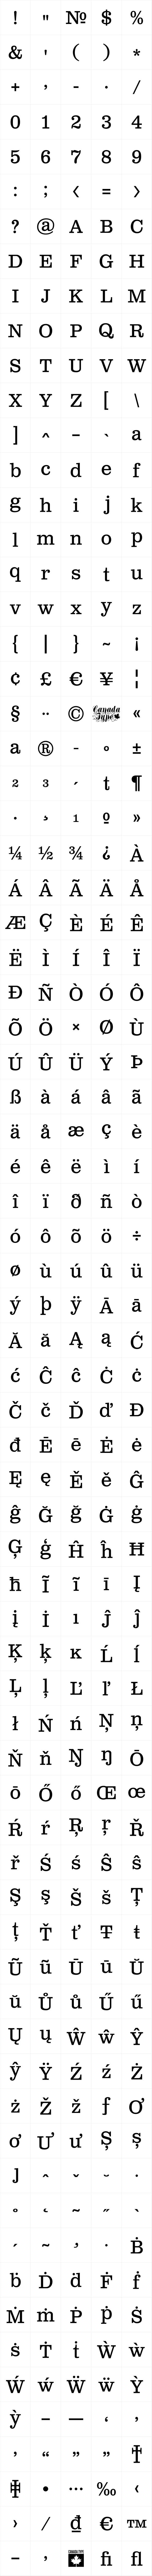 Clarendon Text